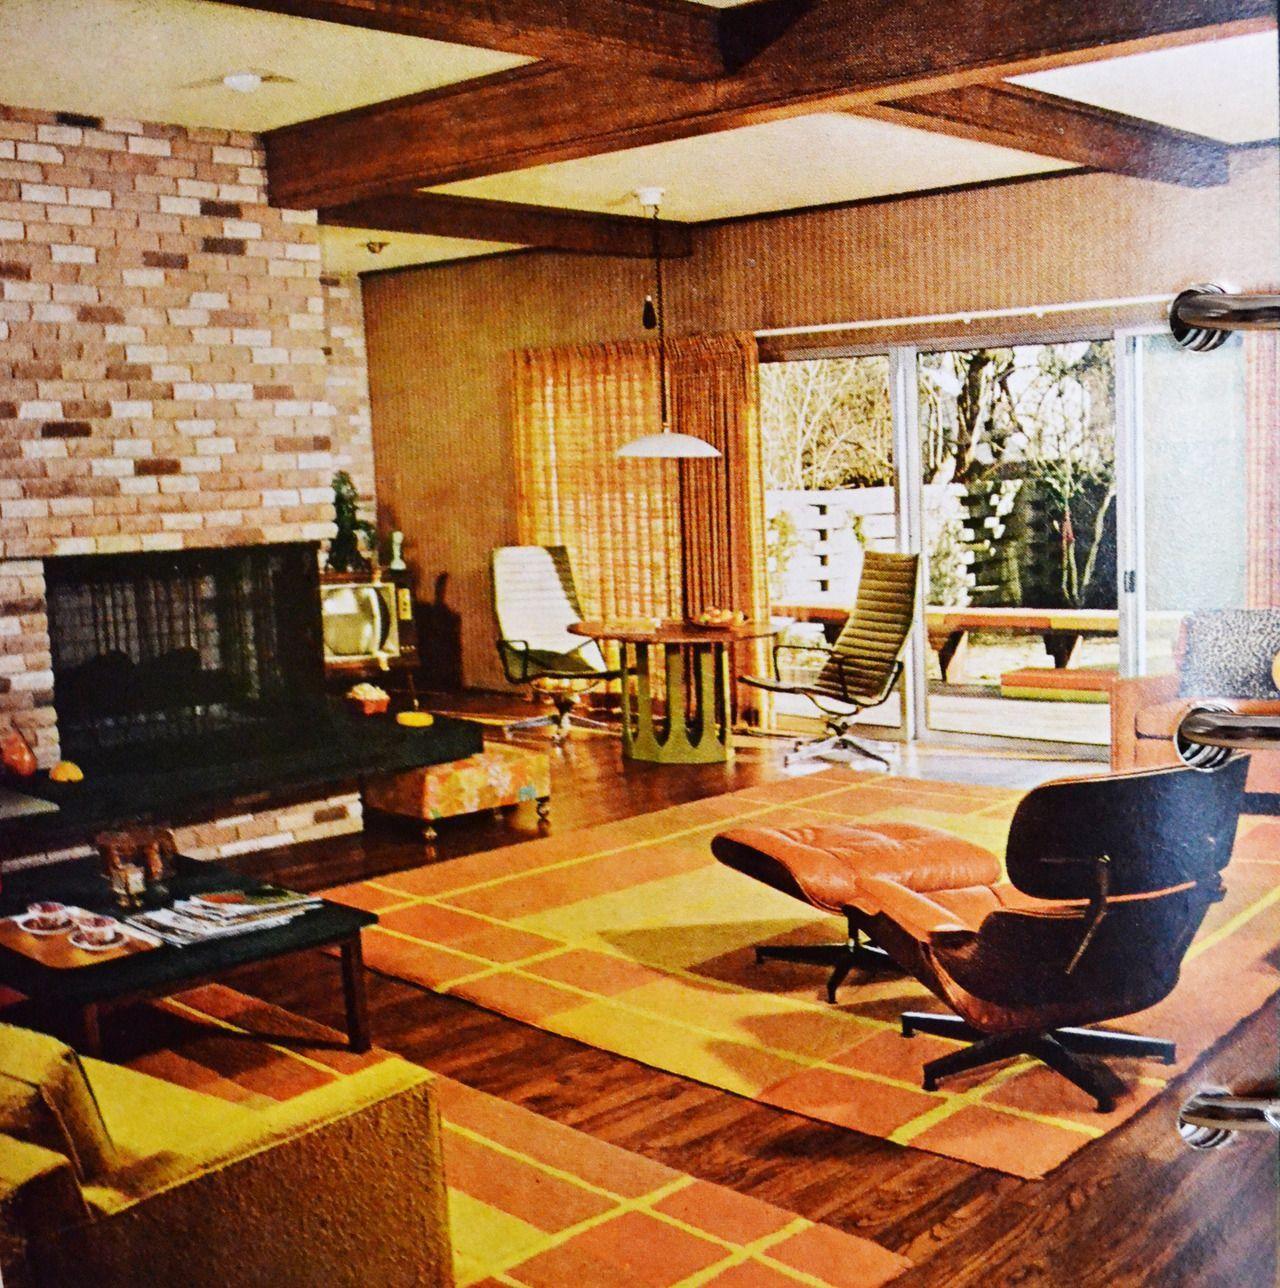 5 Amazing Cool Ideas Modern Vintage Home Decor Front Doors Vintage Home Decor Bedroom Night Stands Vintage Home 1960s Home Decor 60s Home Decor 70s Home Decor